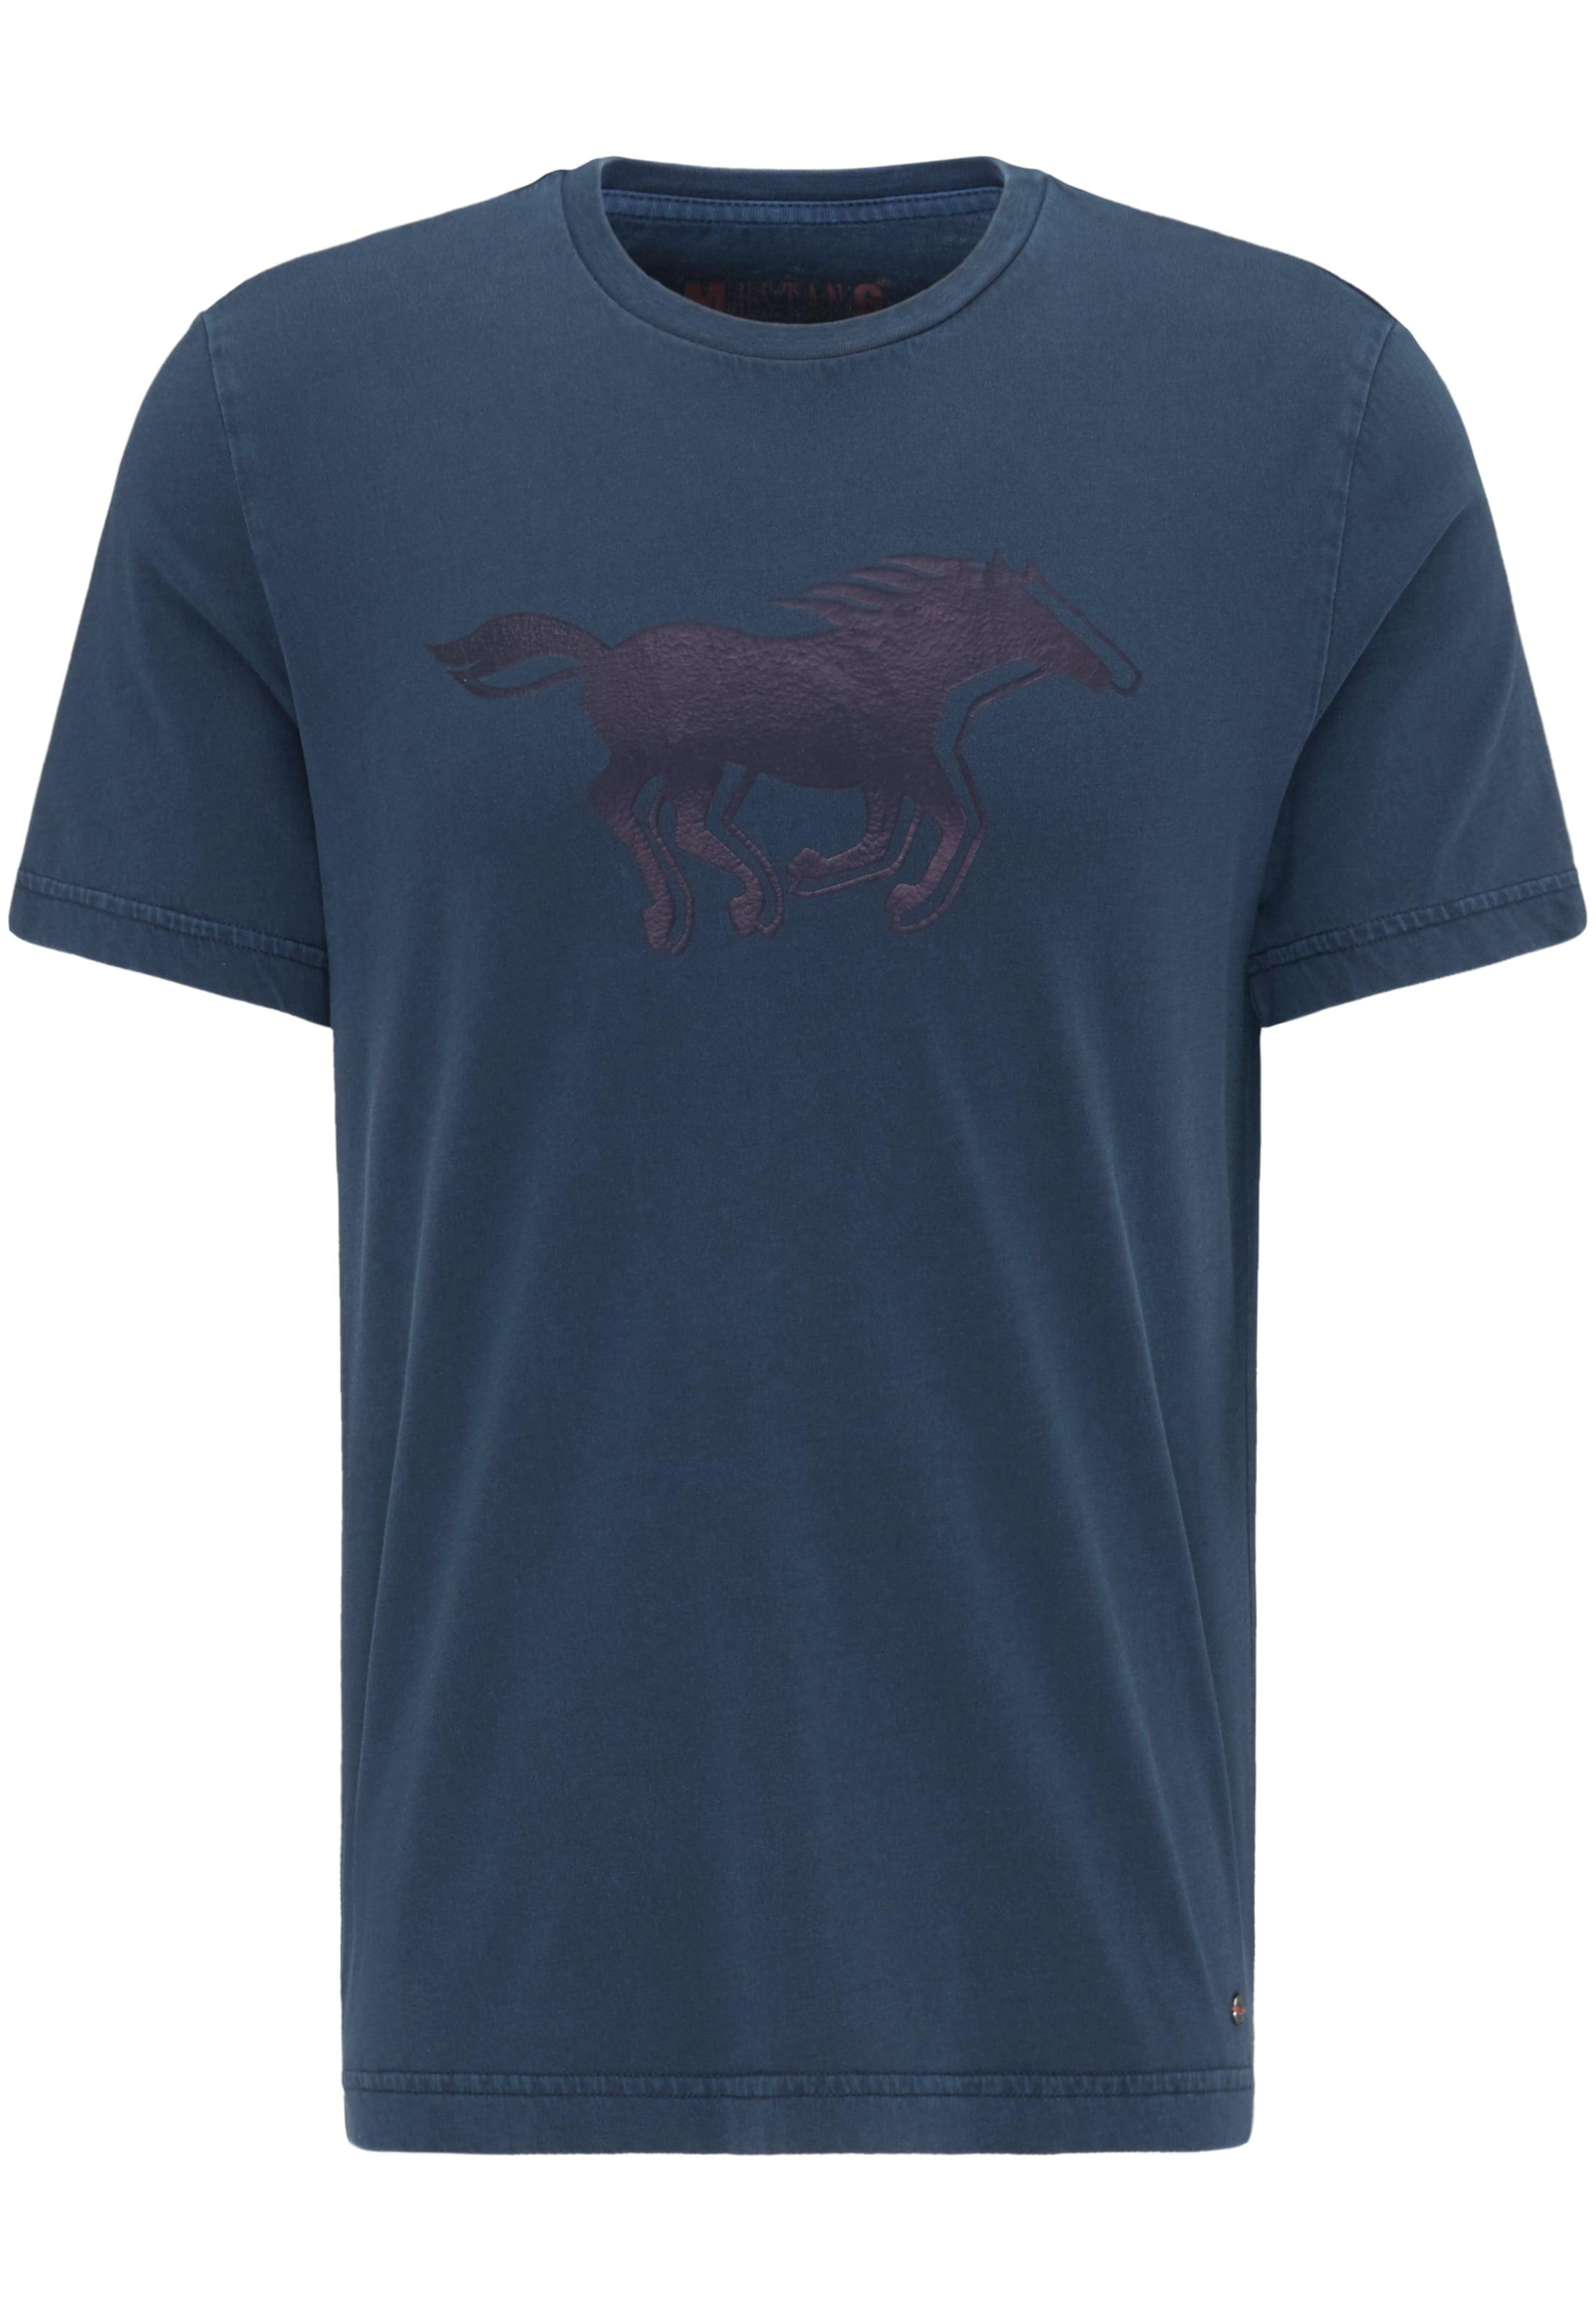 shirt 'horse Tee' Mustang In NavyDunkelblau T BoCWQxerd